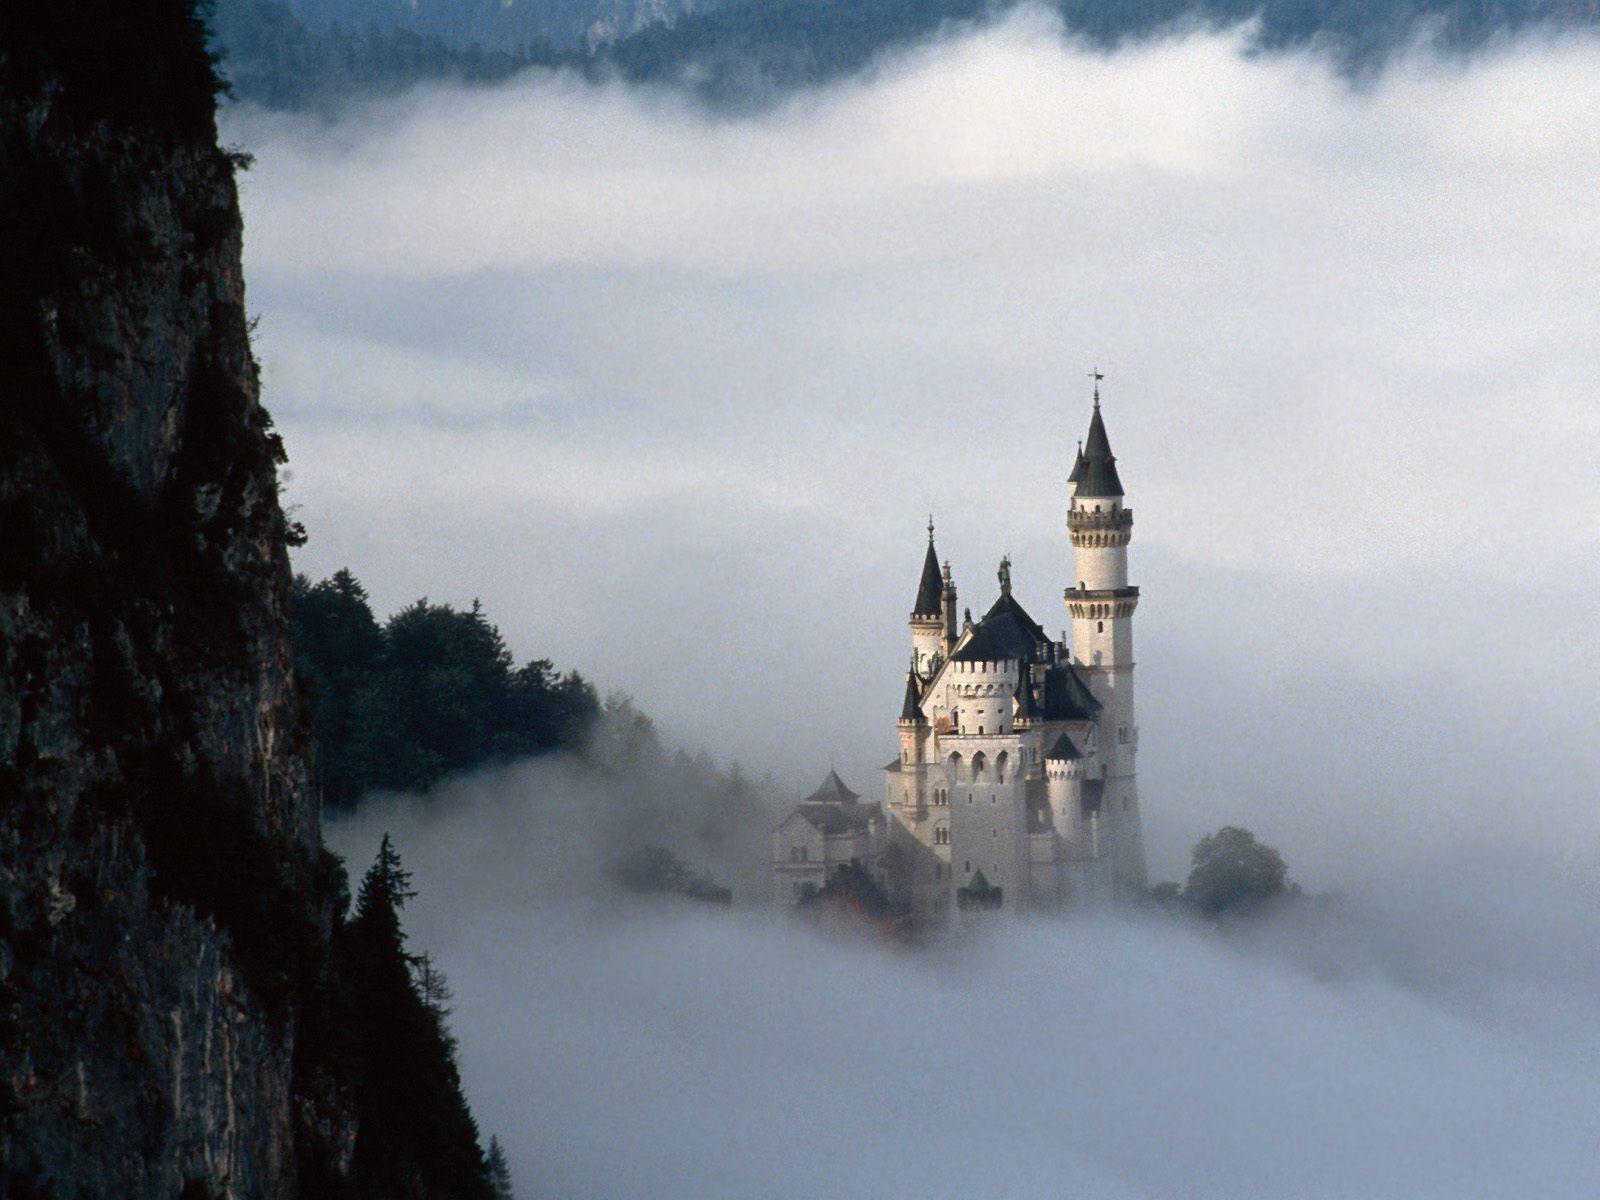 world visits neuschwanstein castle in germany travel guide. Black Bedroom Furniture Sets. Home Design Ideas